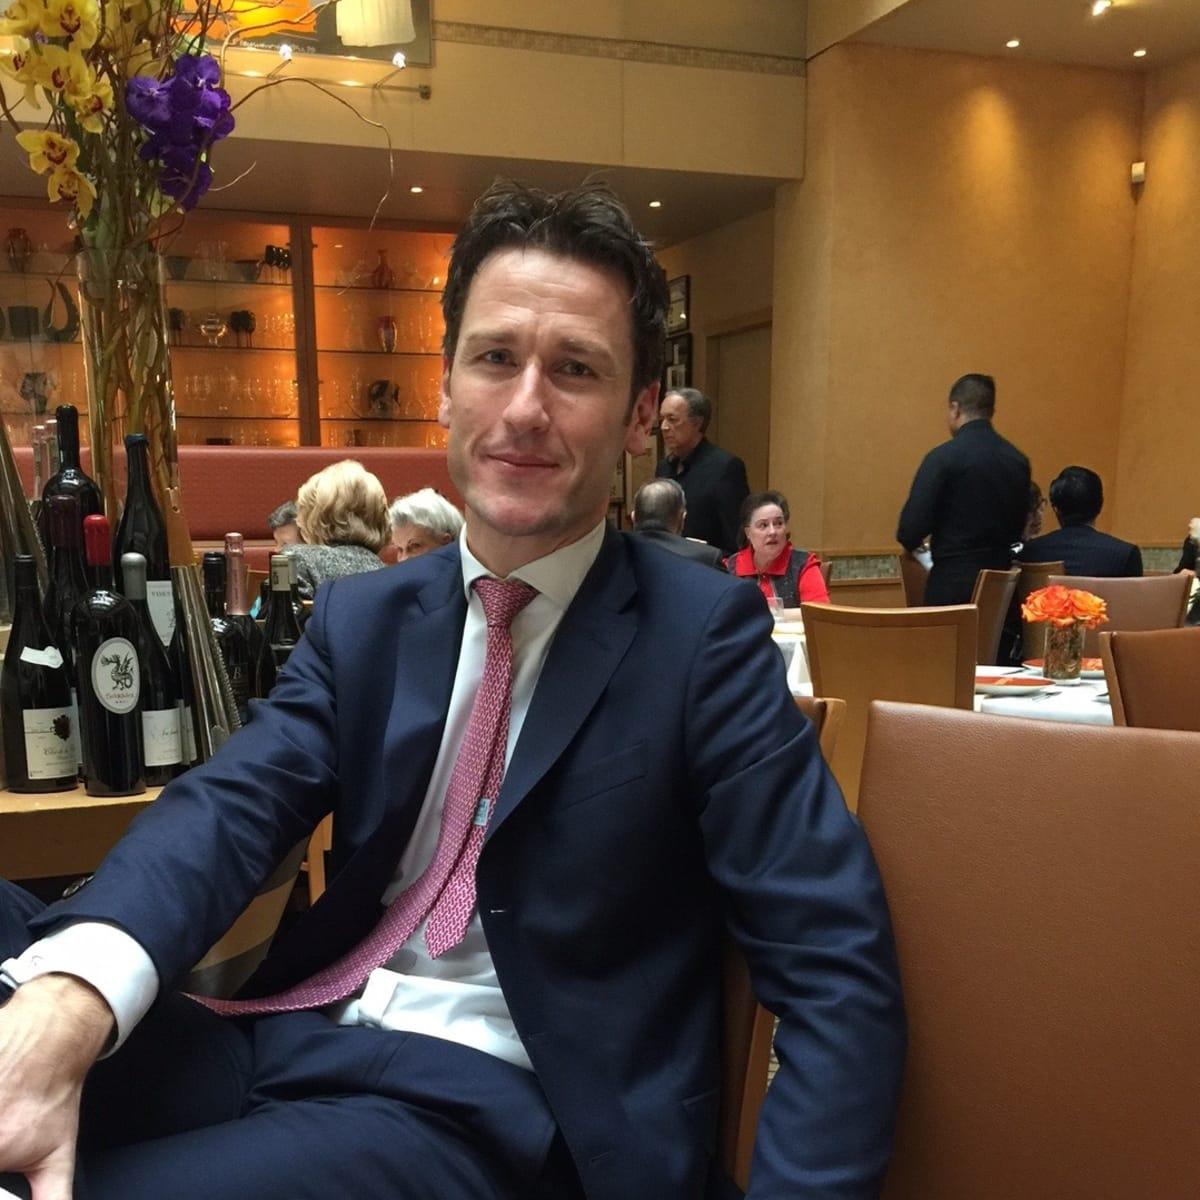 News, Ritz Hotel Paris, Christian Boyens, General Manager, Jan. 2016